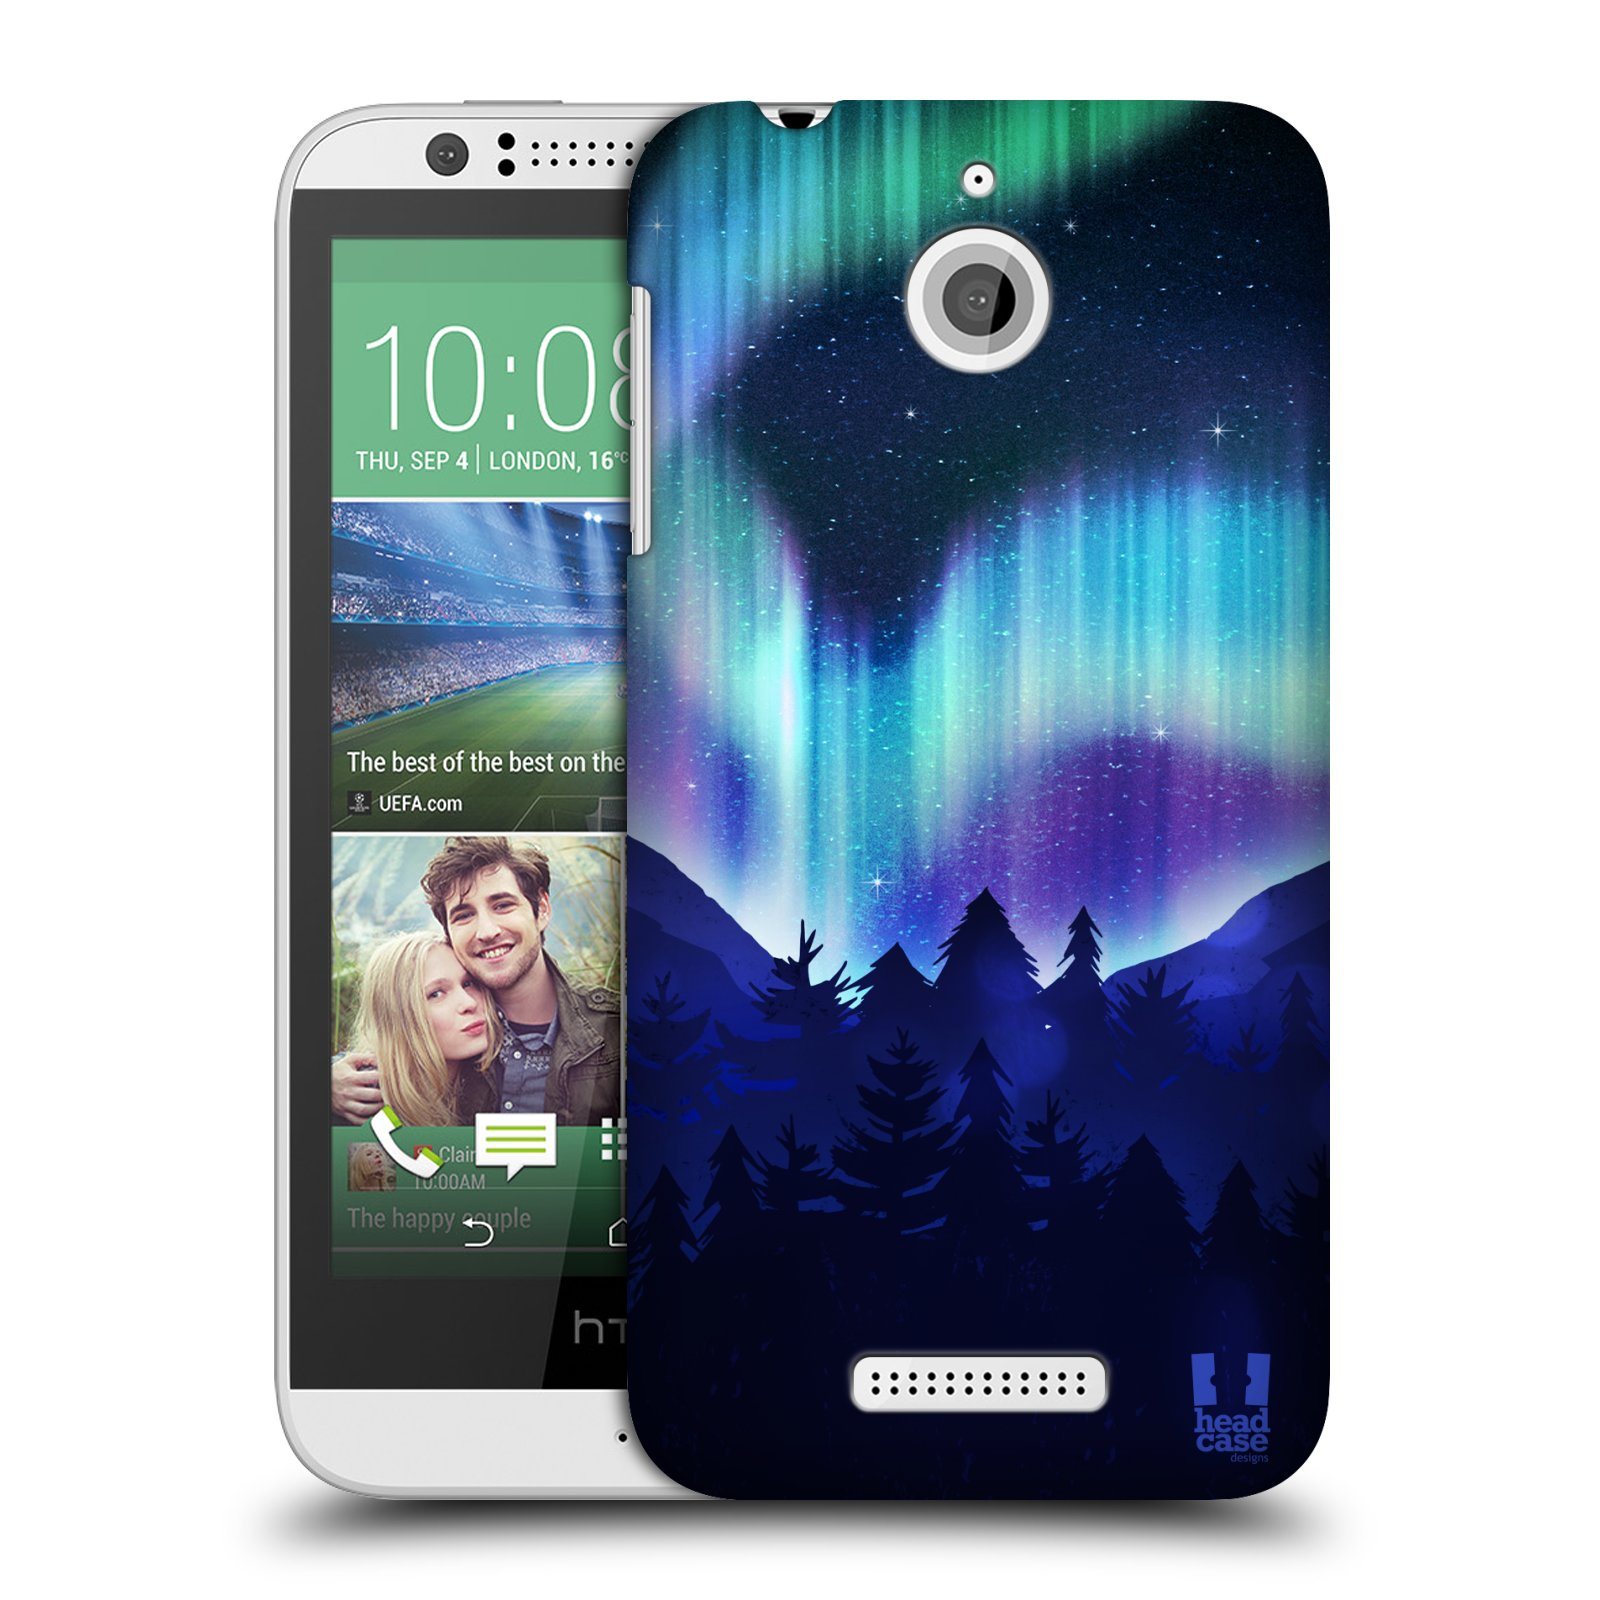 HEAD CASE DESIGNS NORTHERN LIGHTS HARD BACK CASE FOR HTC PHONES 2